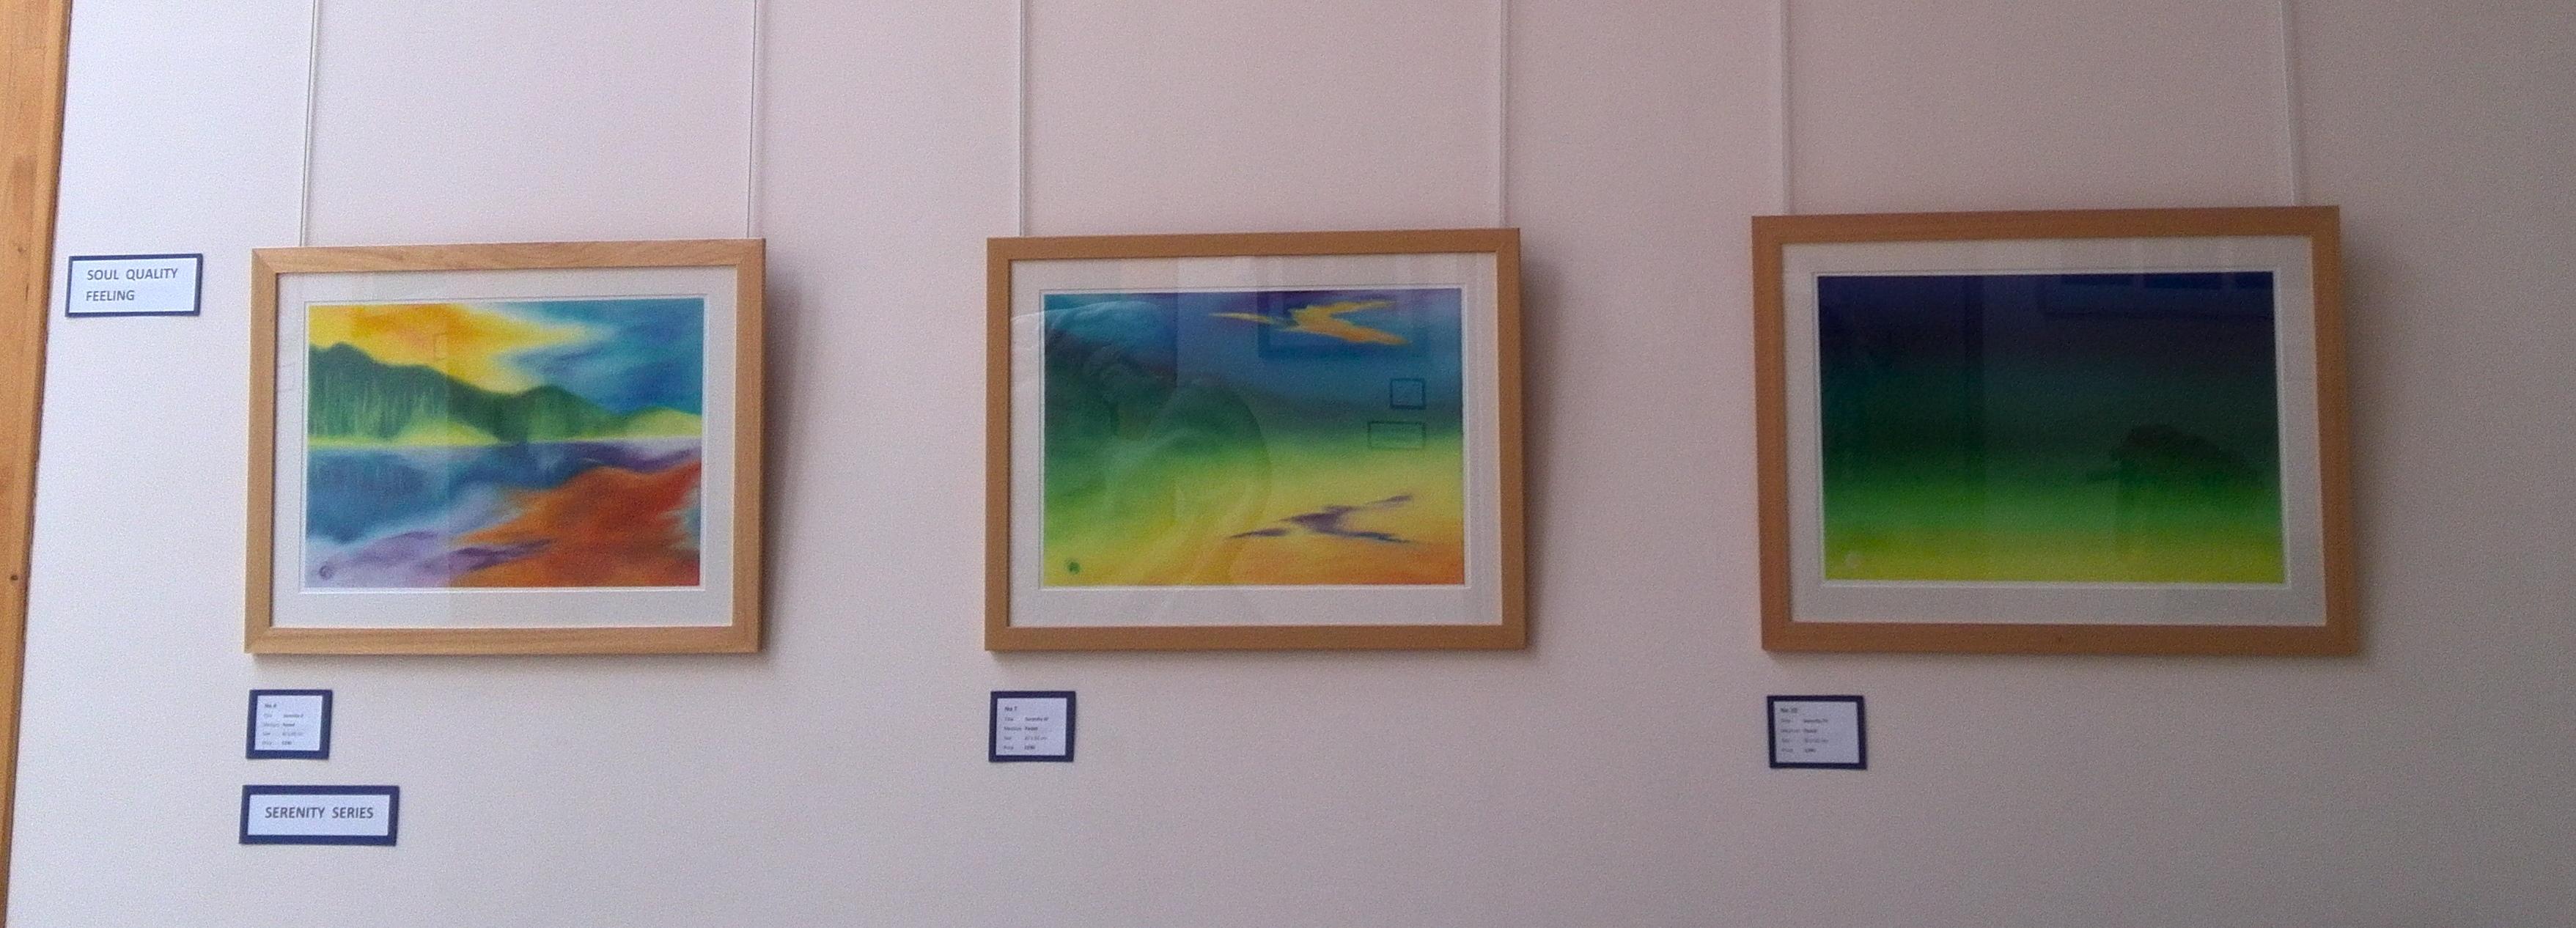 Exhibition - Serenity series